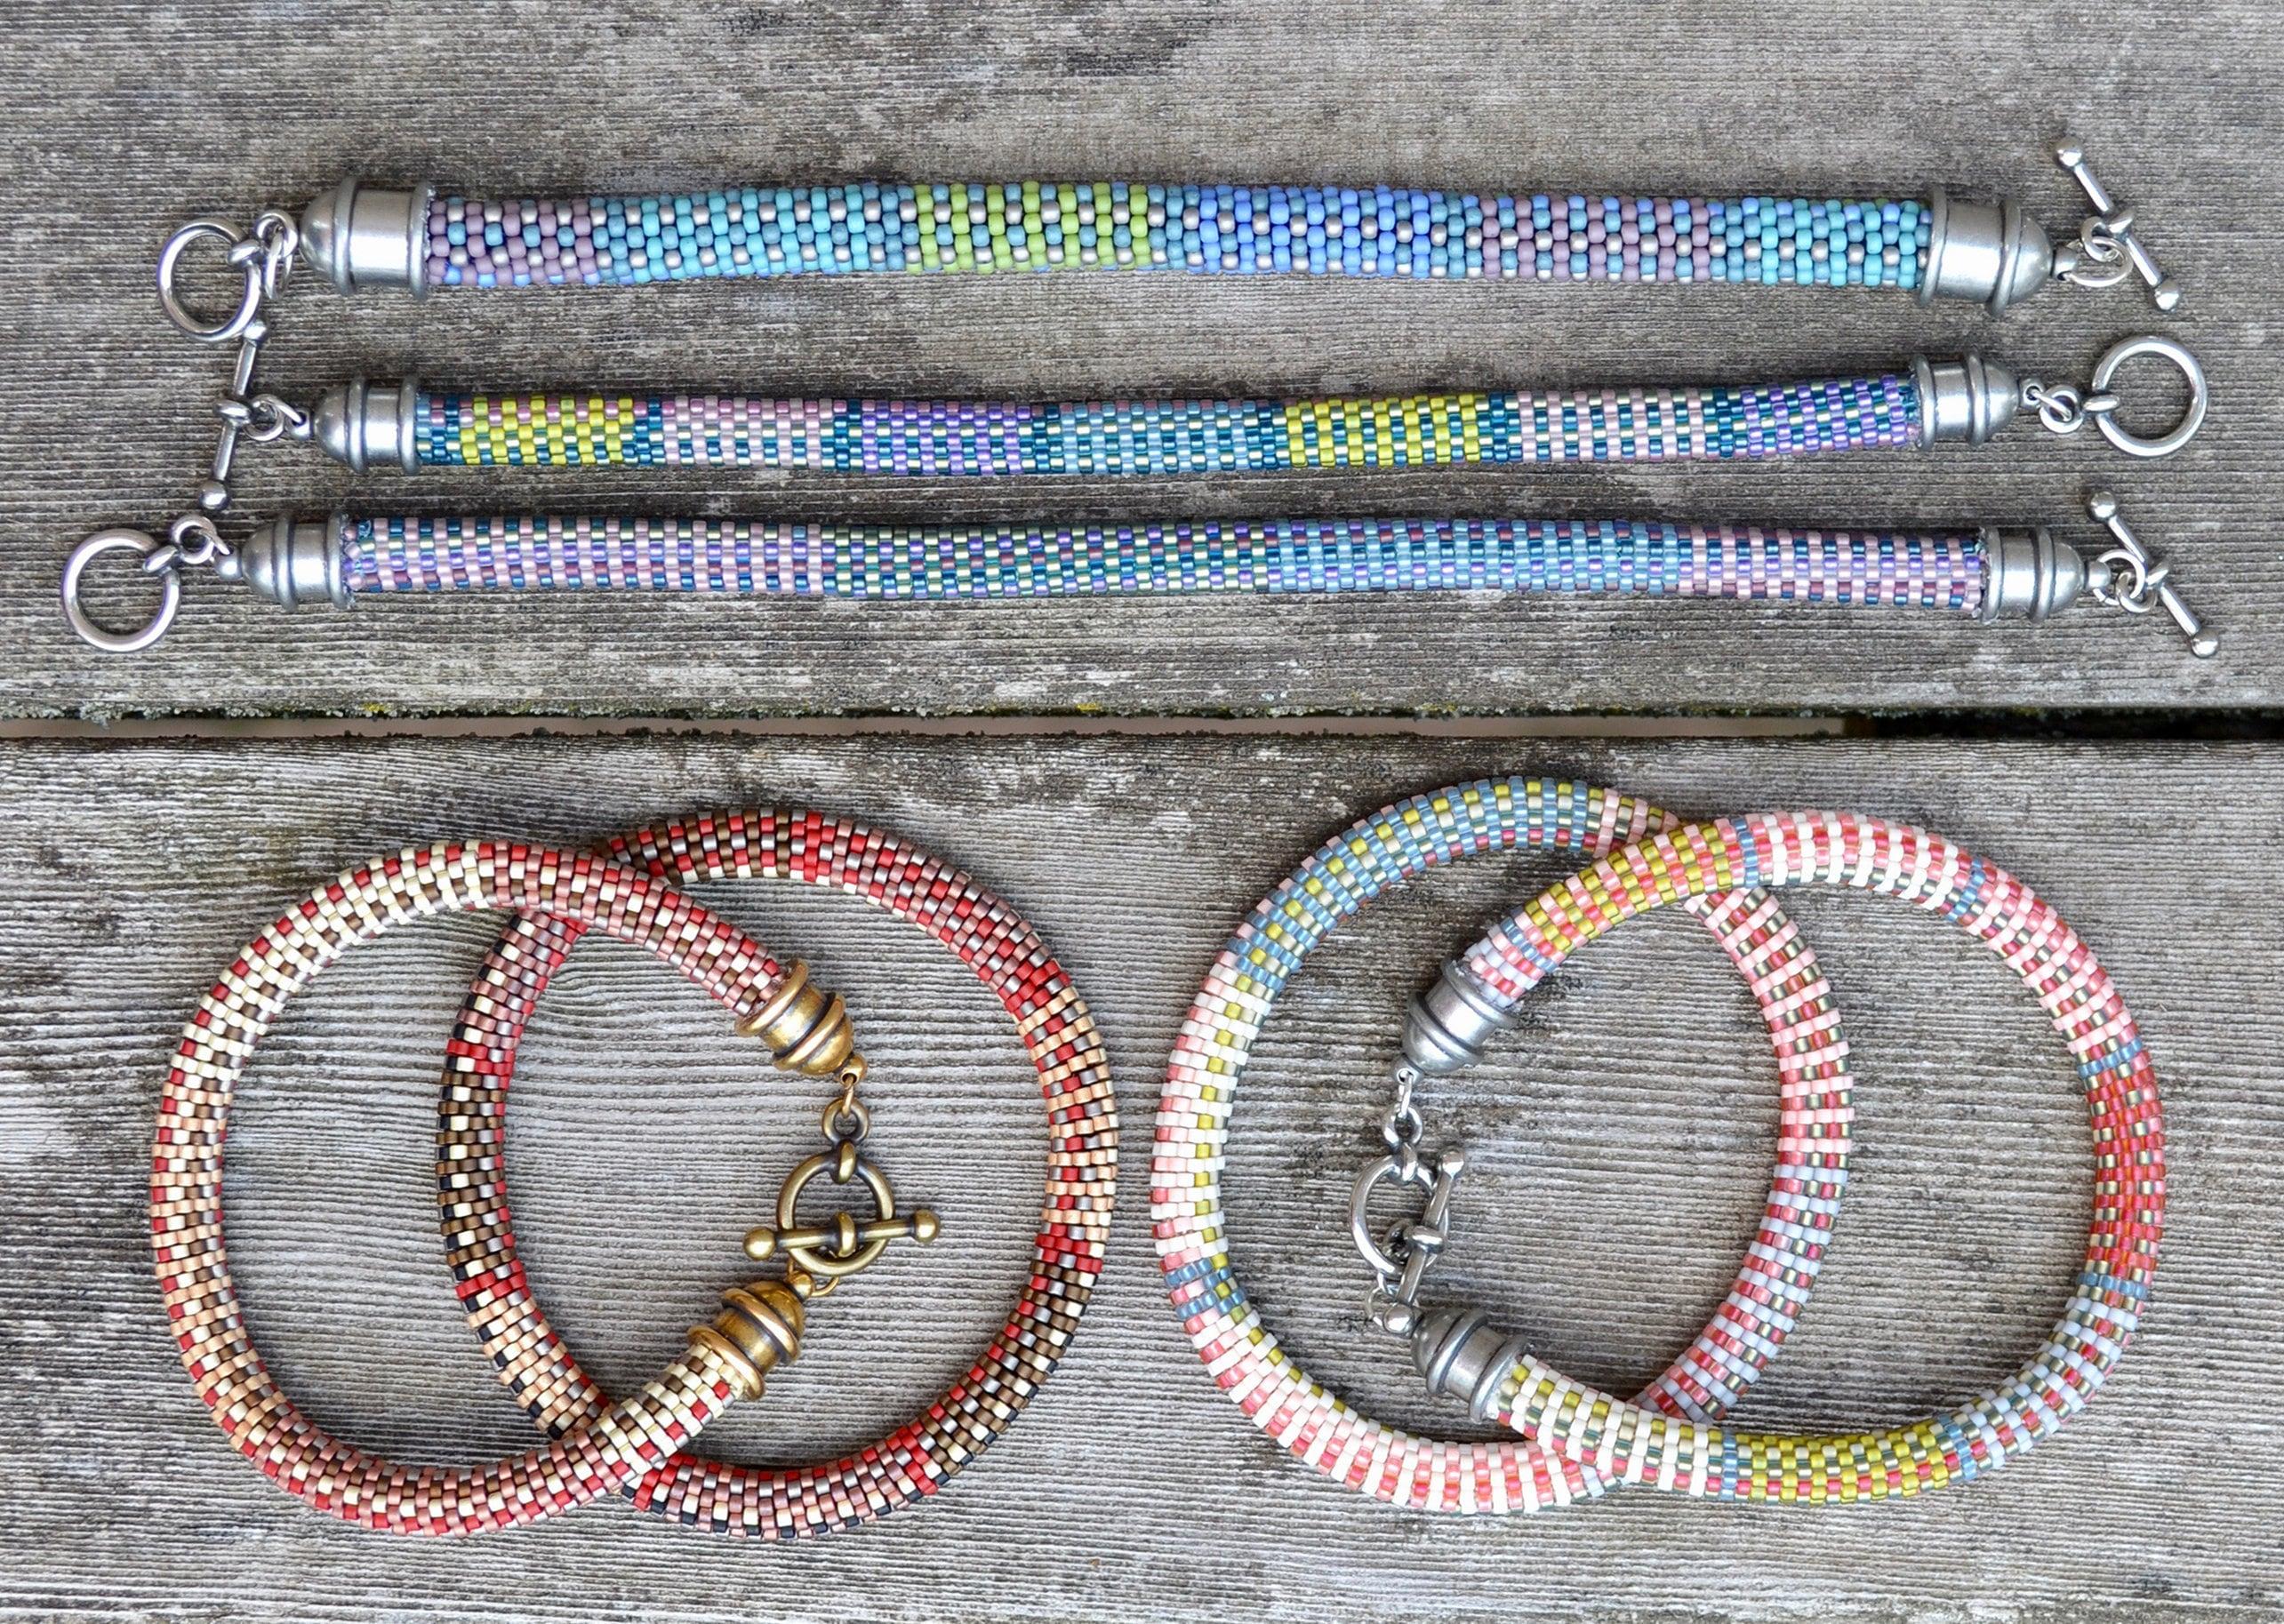 10 Bead Crochet Patterns Using Slip Stitch Bead Crochet Designer